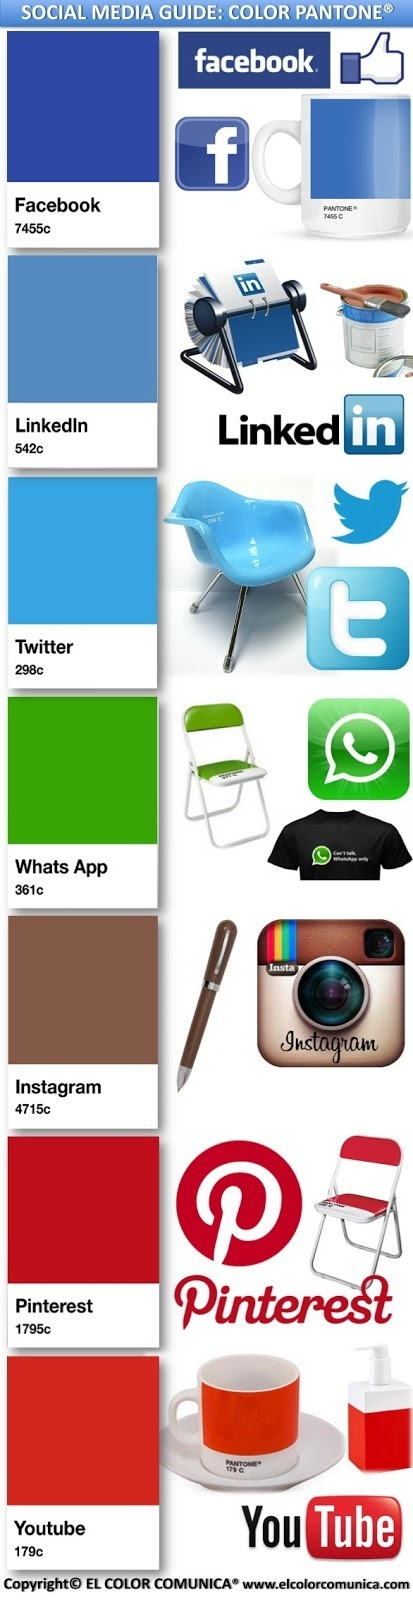 Colour Guide for Social Media | Community Management & Social Media | Scoop.it